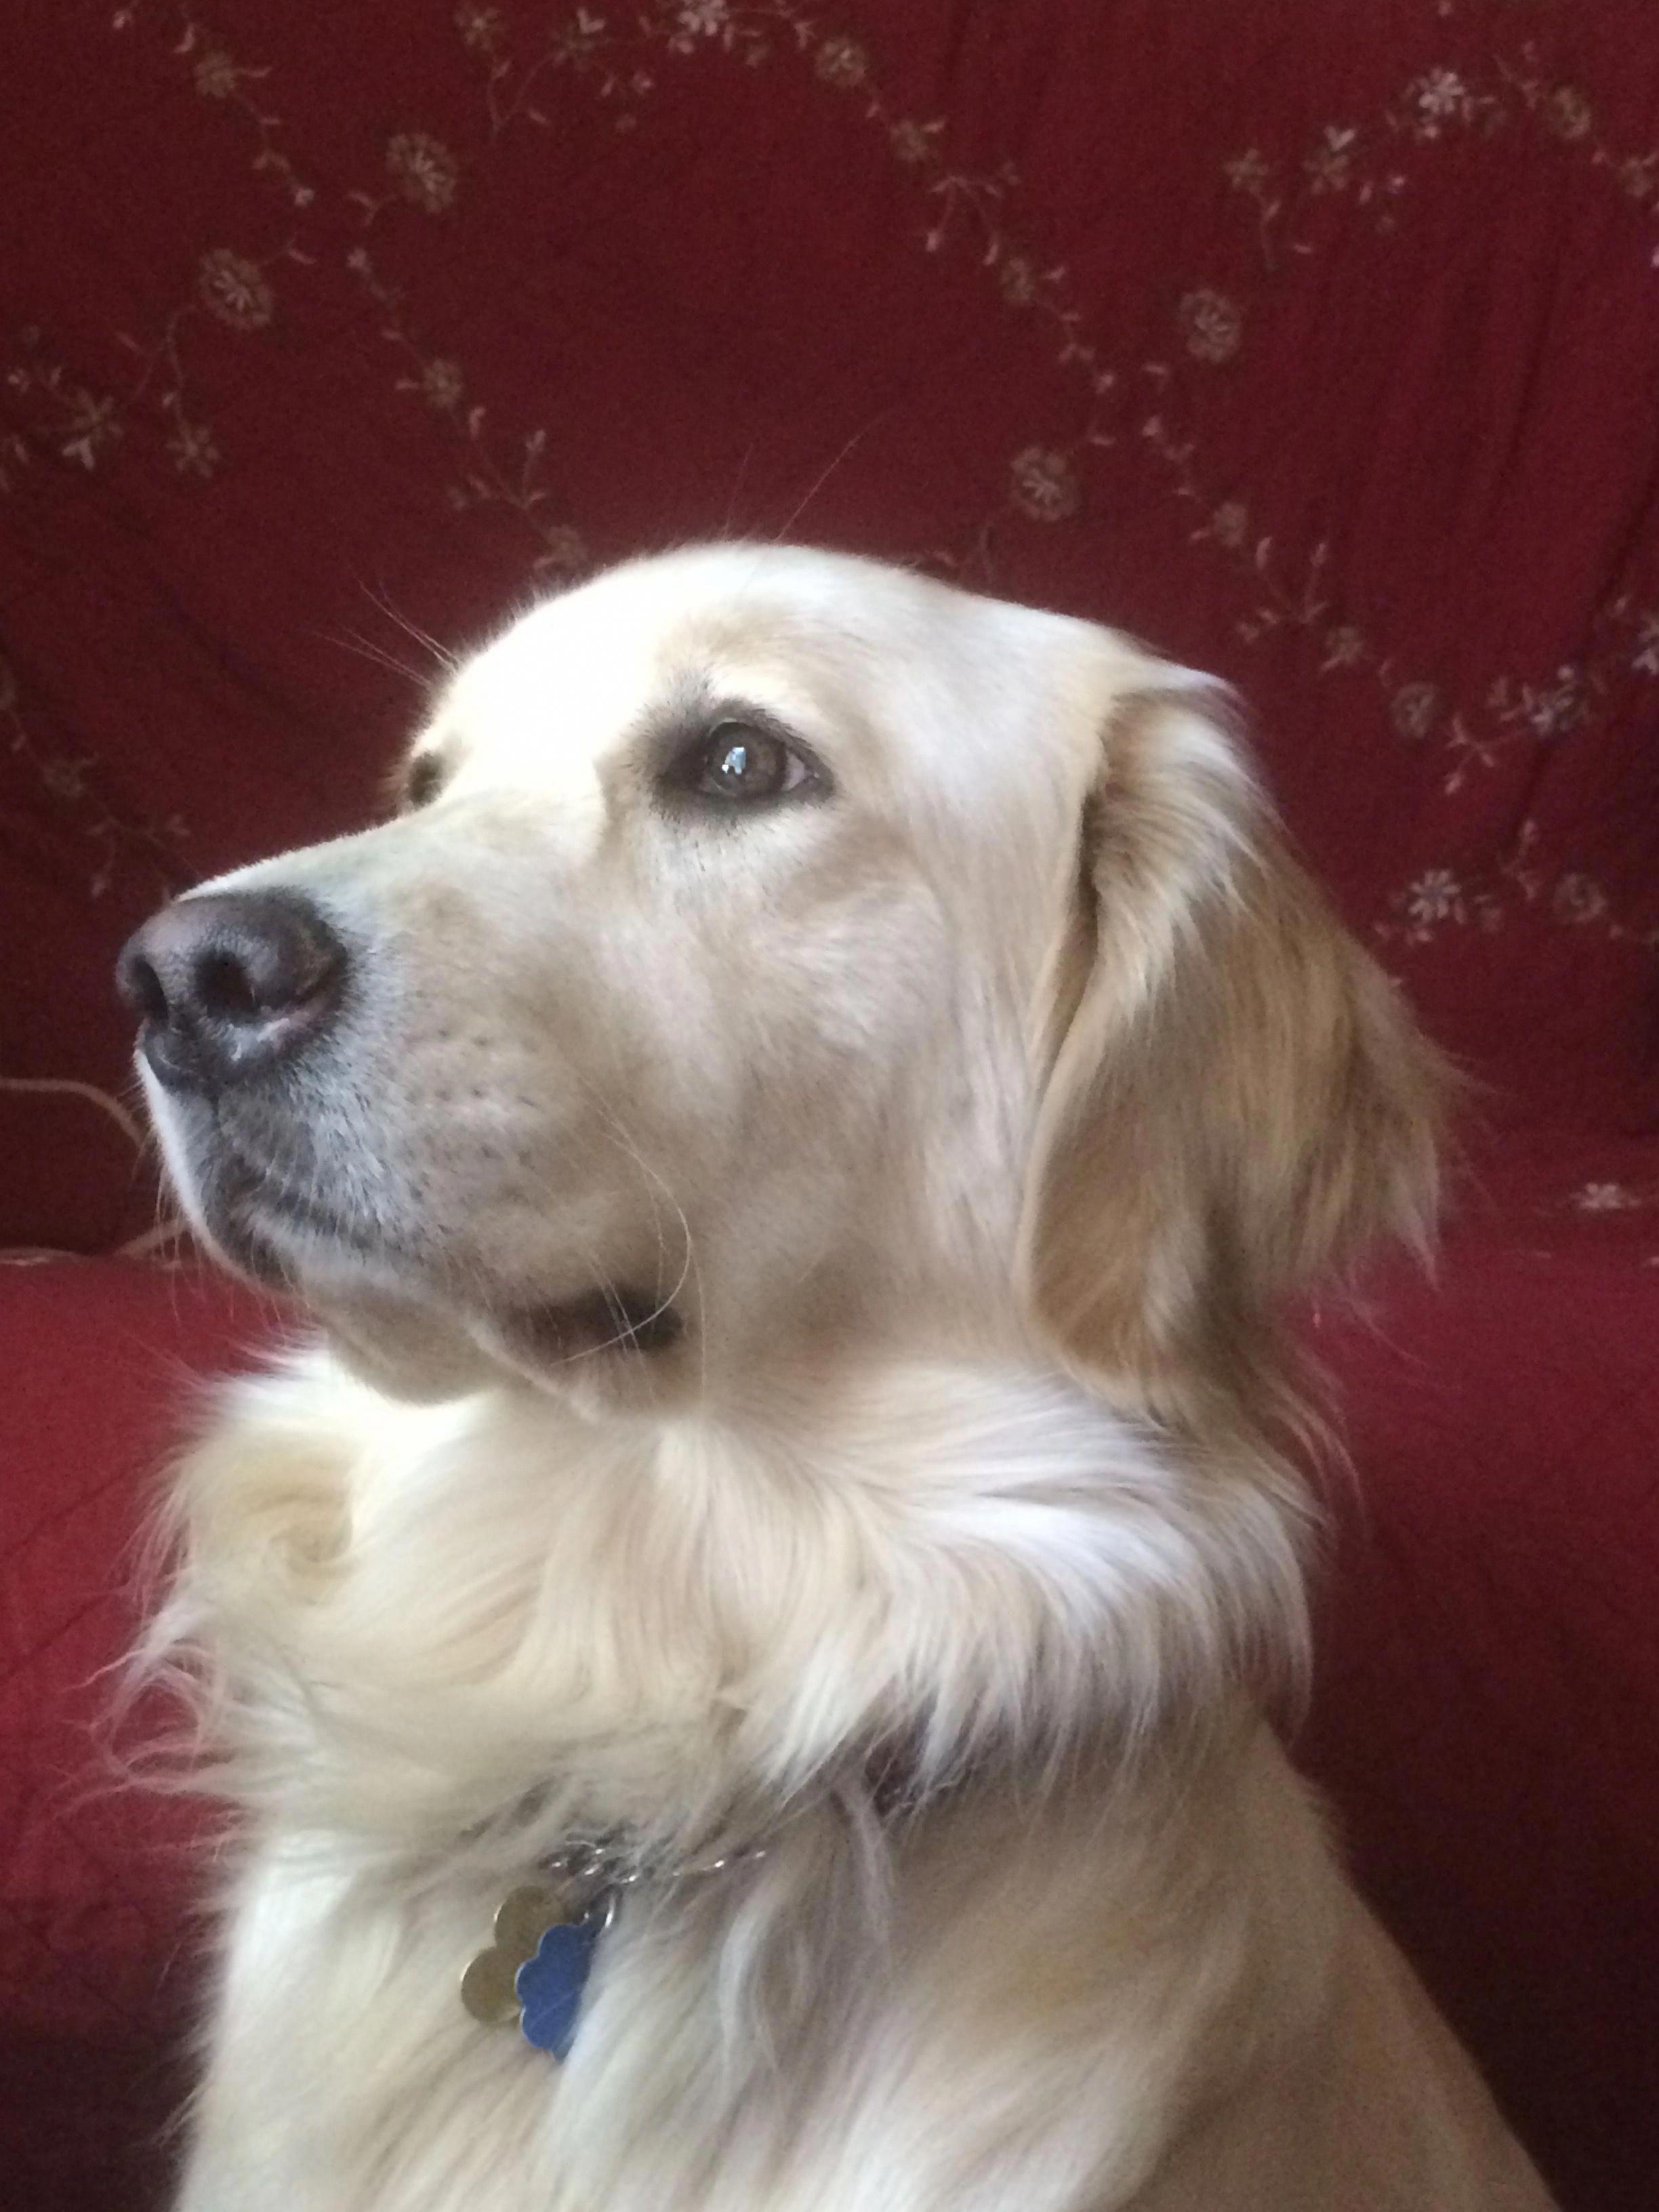 The Traits I Enjoy About The Trustworthy Golden Retriever Goldenretrieveraustralia Goldenretrieverpuppyineg Golden Retriever Dogs Golden Retriever Retriever